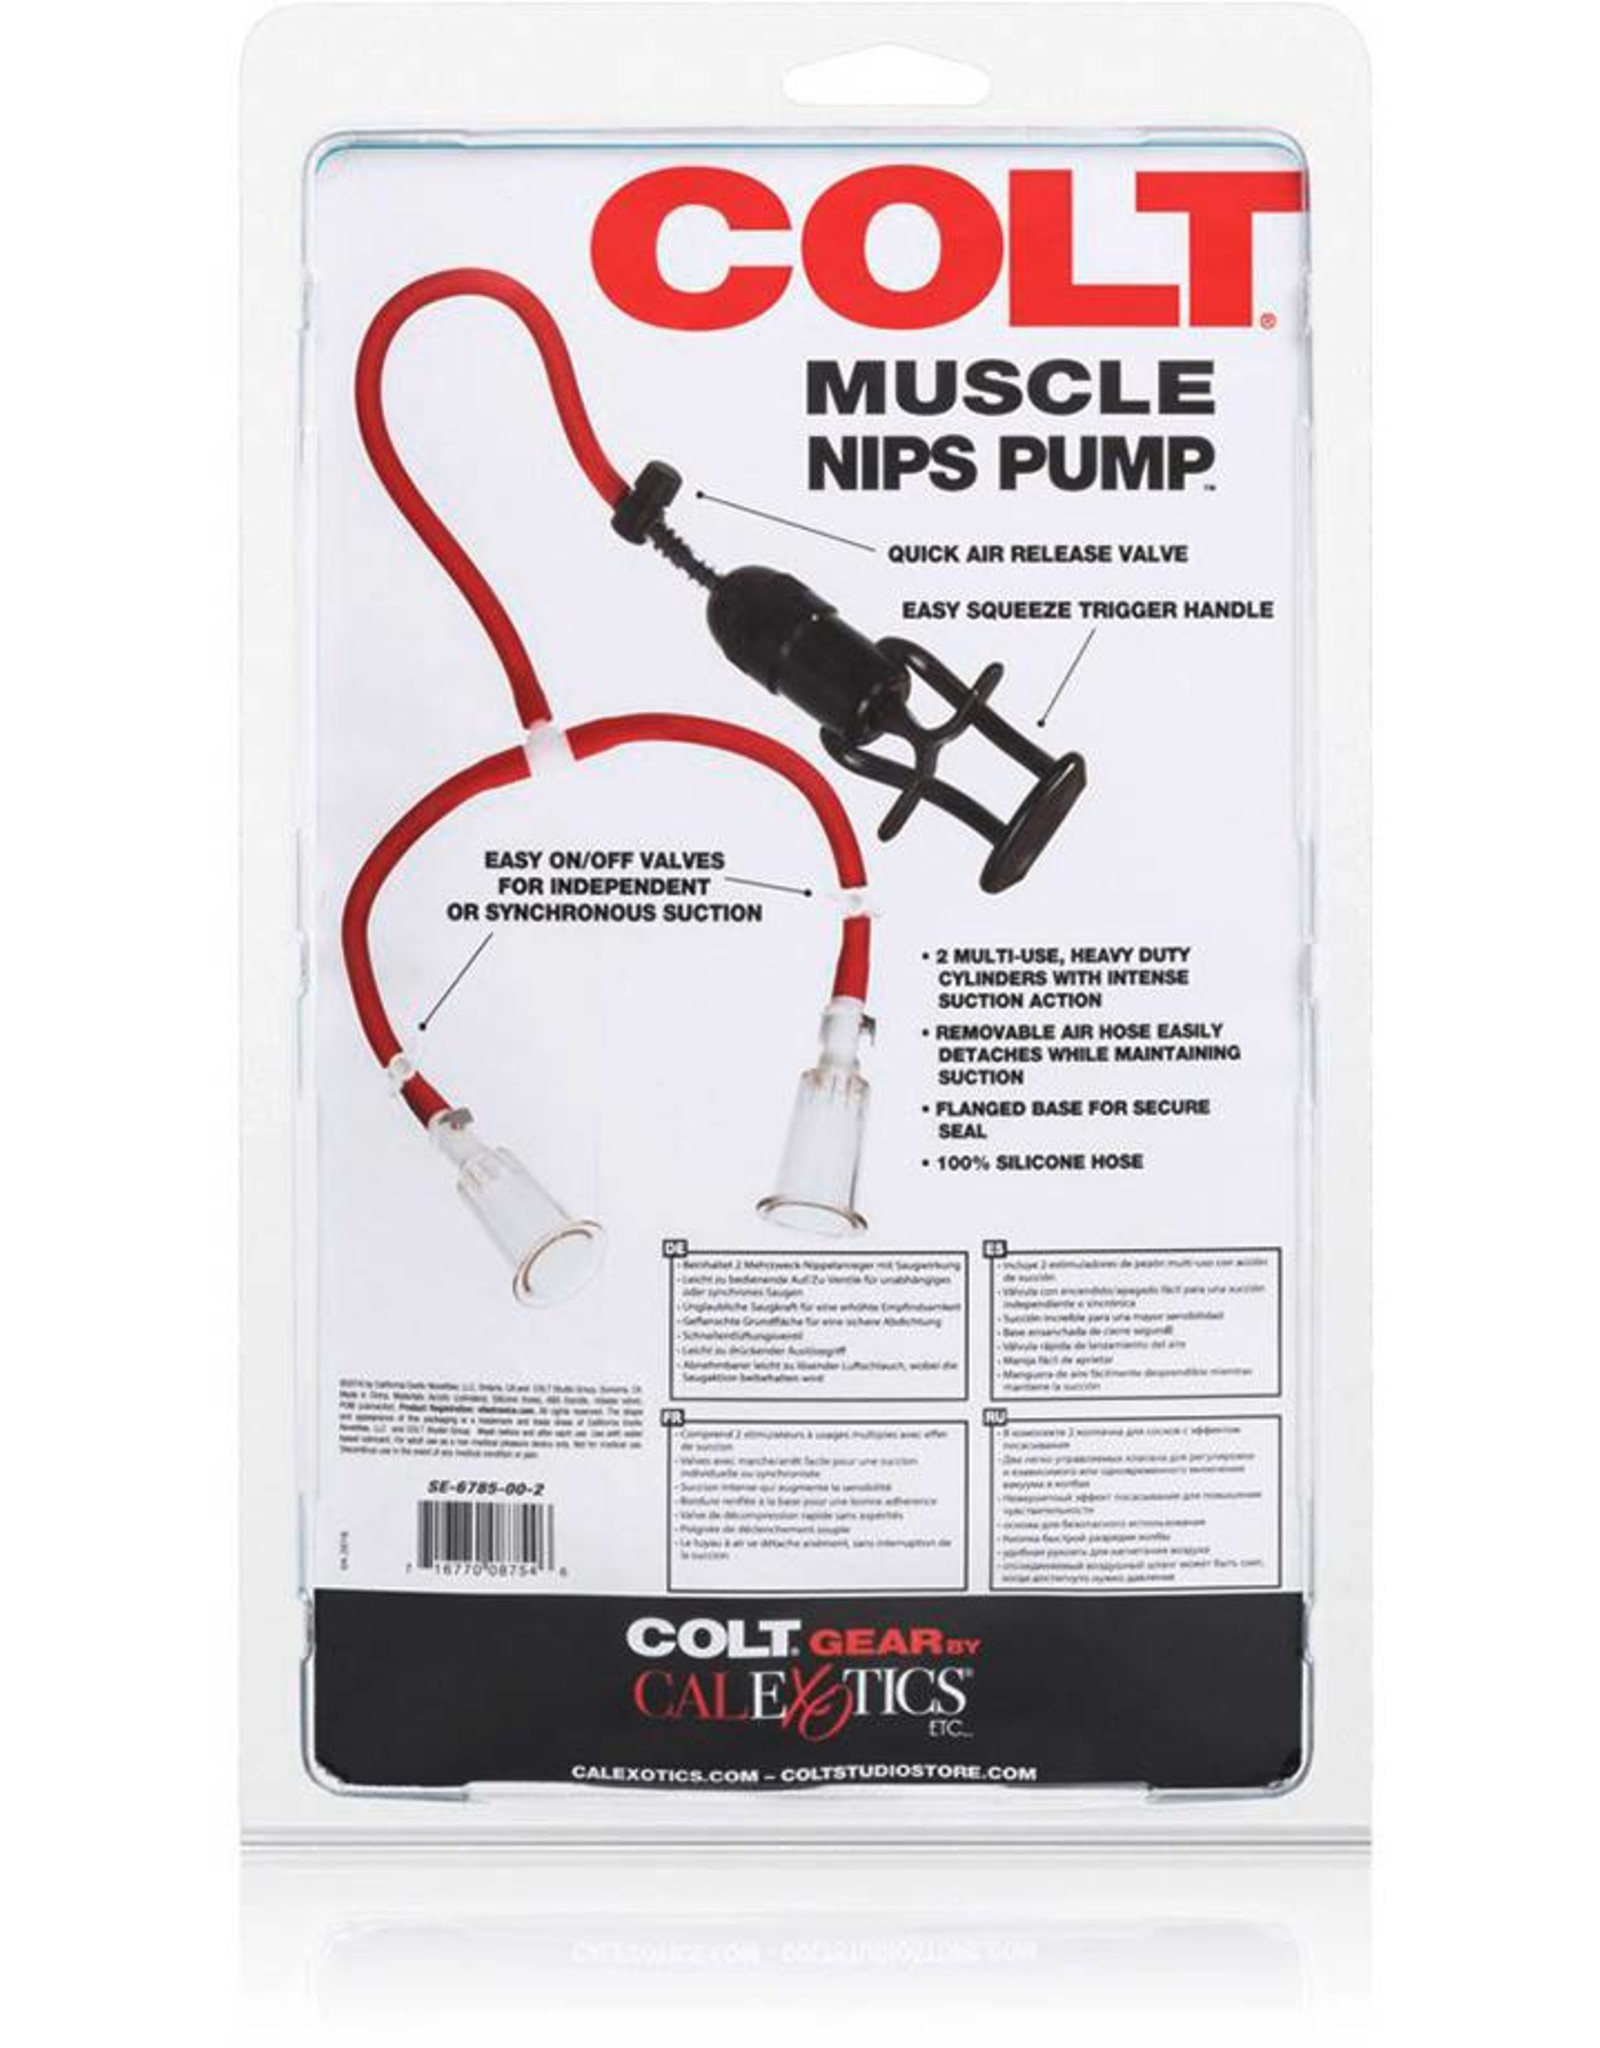 Colt COLT Muscle Nips Pump Brustwarzensauger